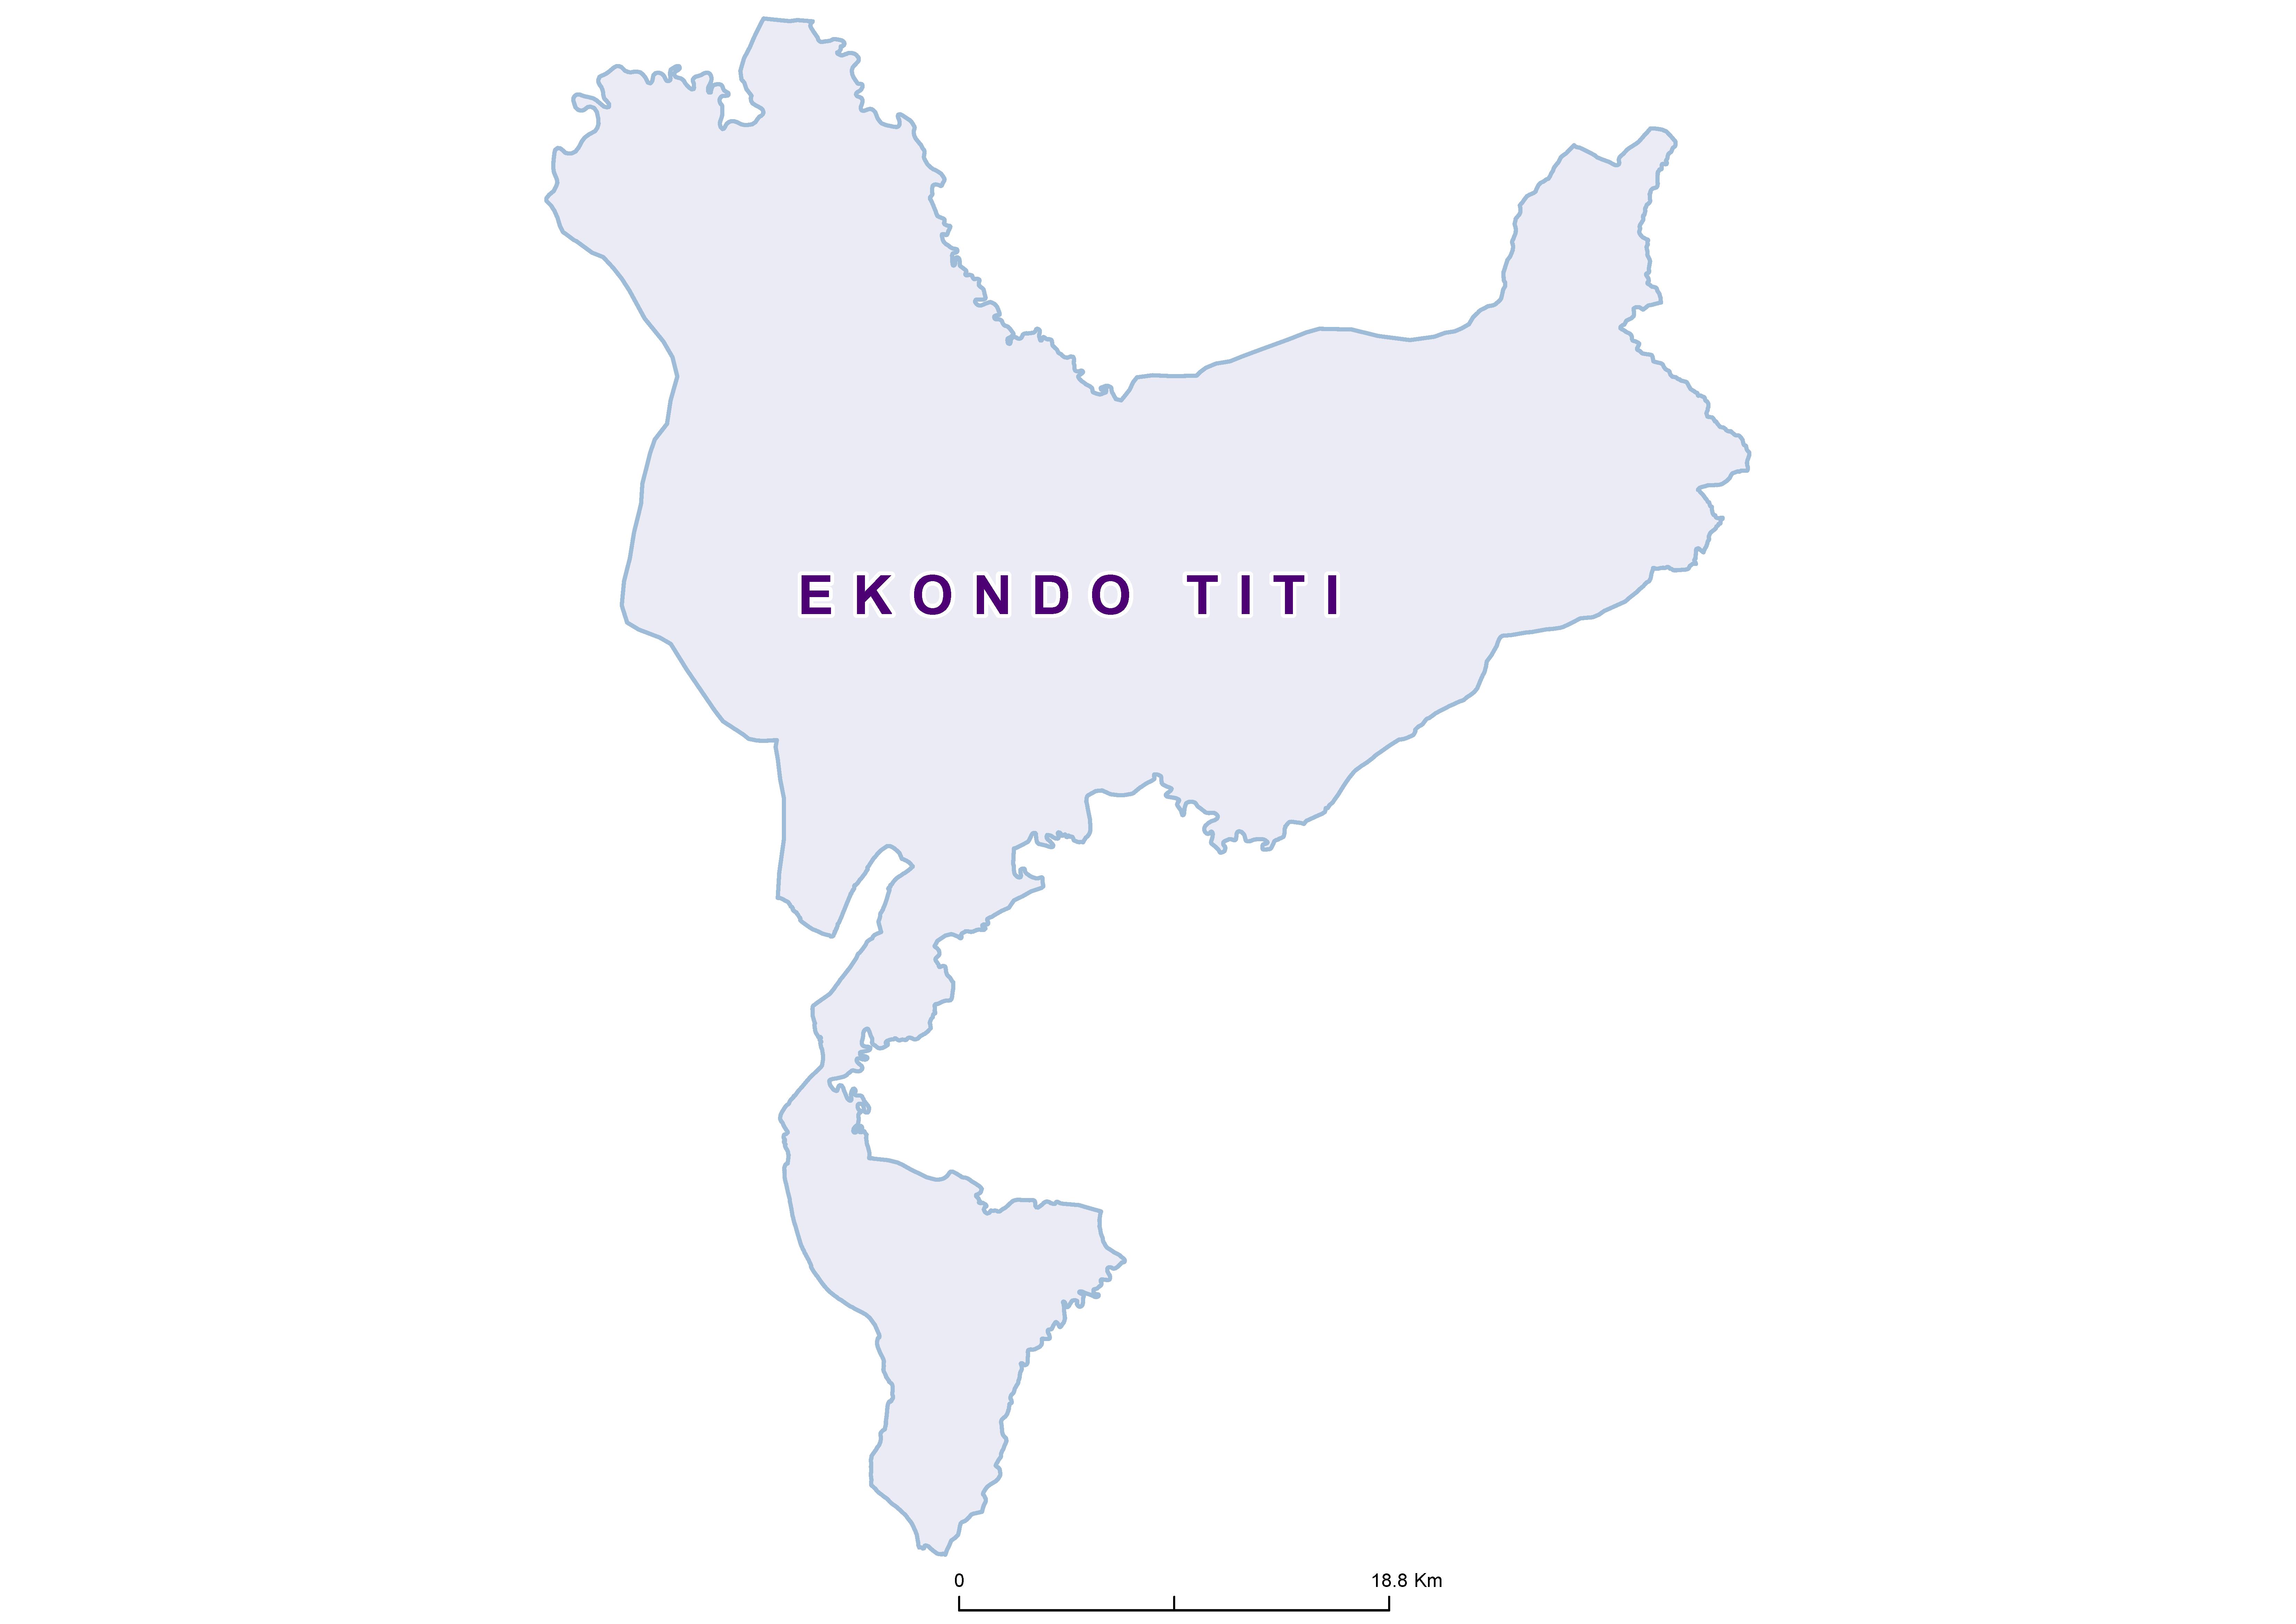 Ekondo titi Mean SCH 20180001